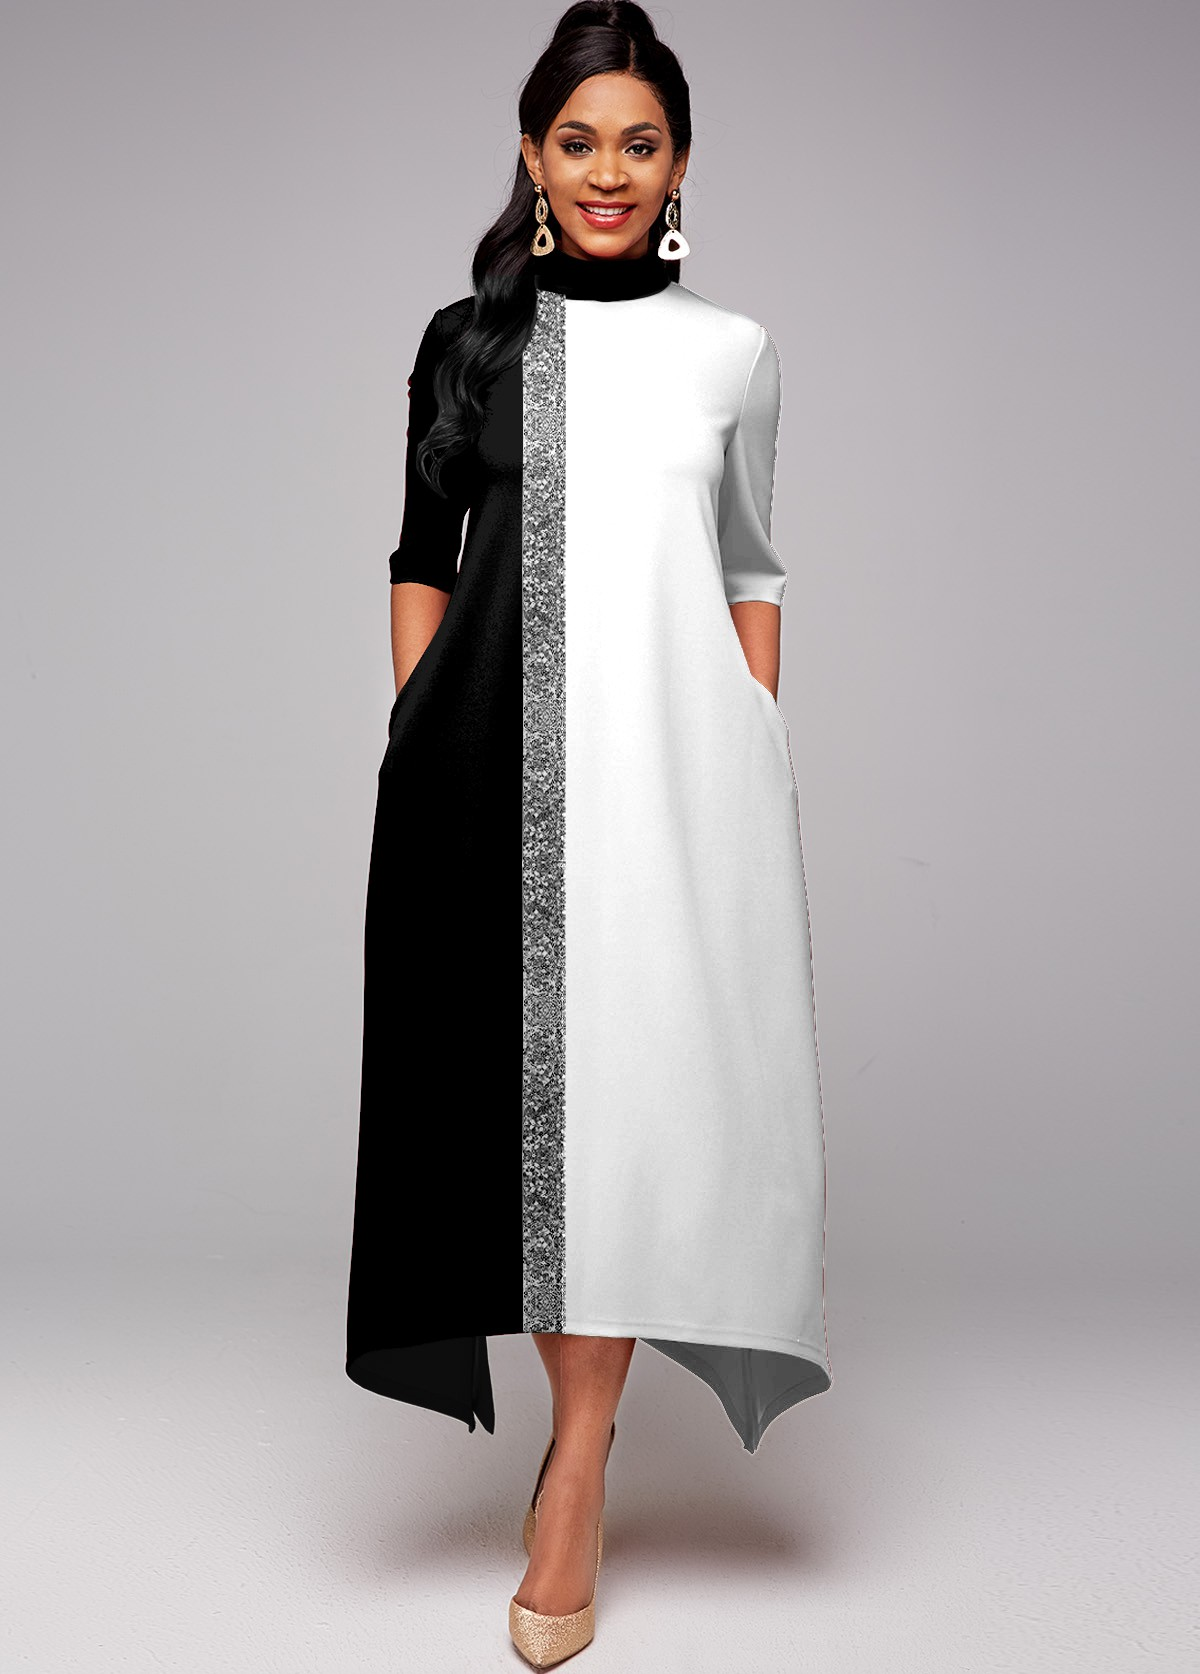 ROTITA Sequin Double Side Pocket Contrast Dress